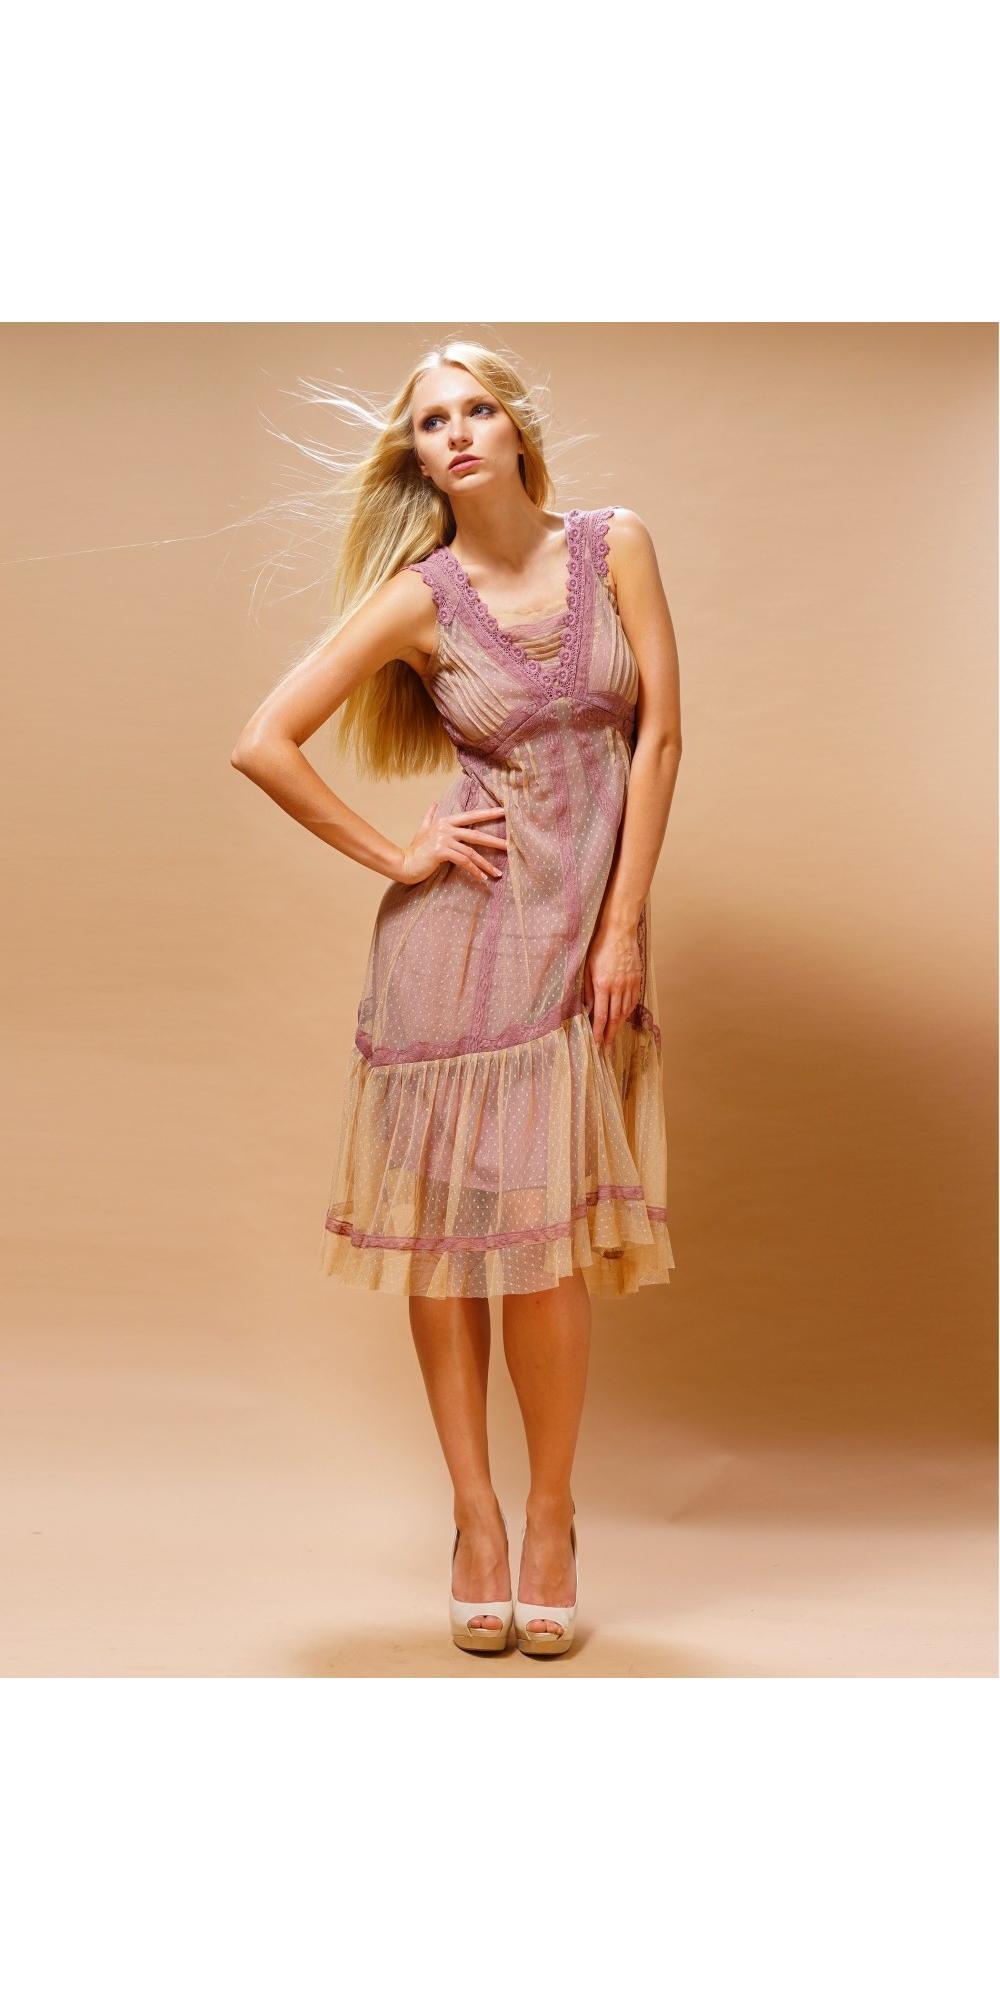 Nataya 220 Bohemian Vintage Inspired Party Dress in Rose Beige